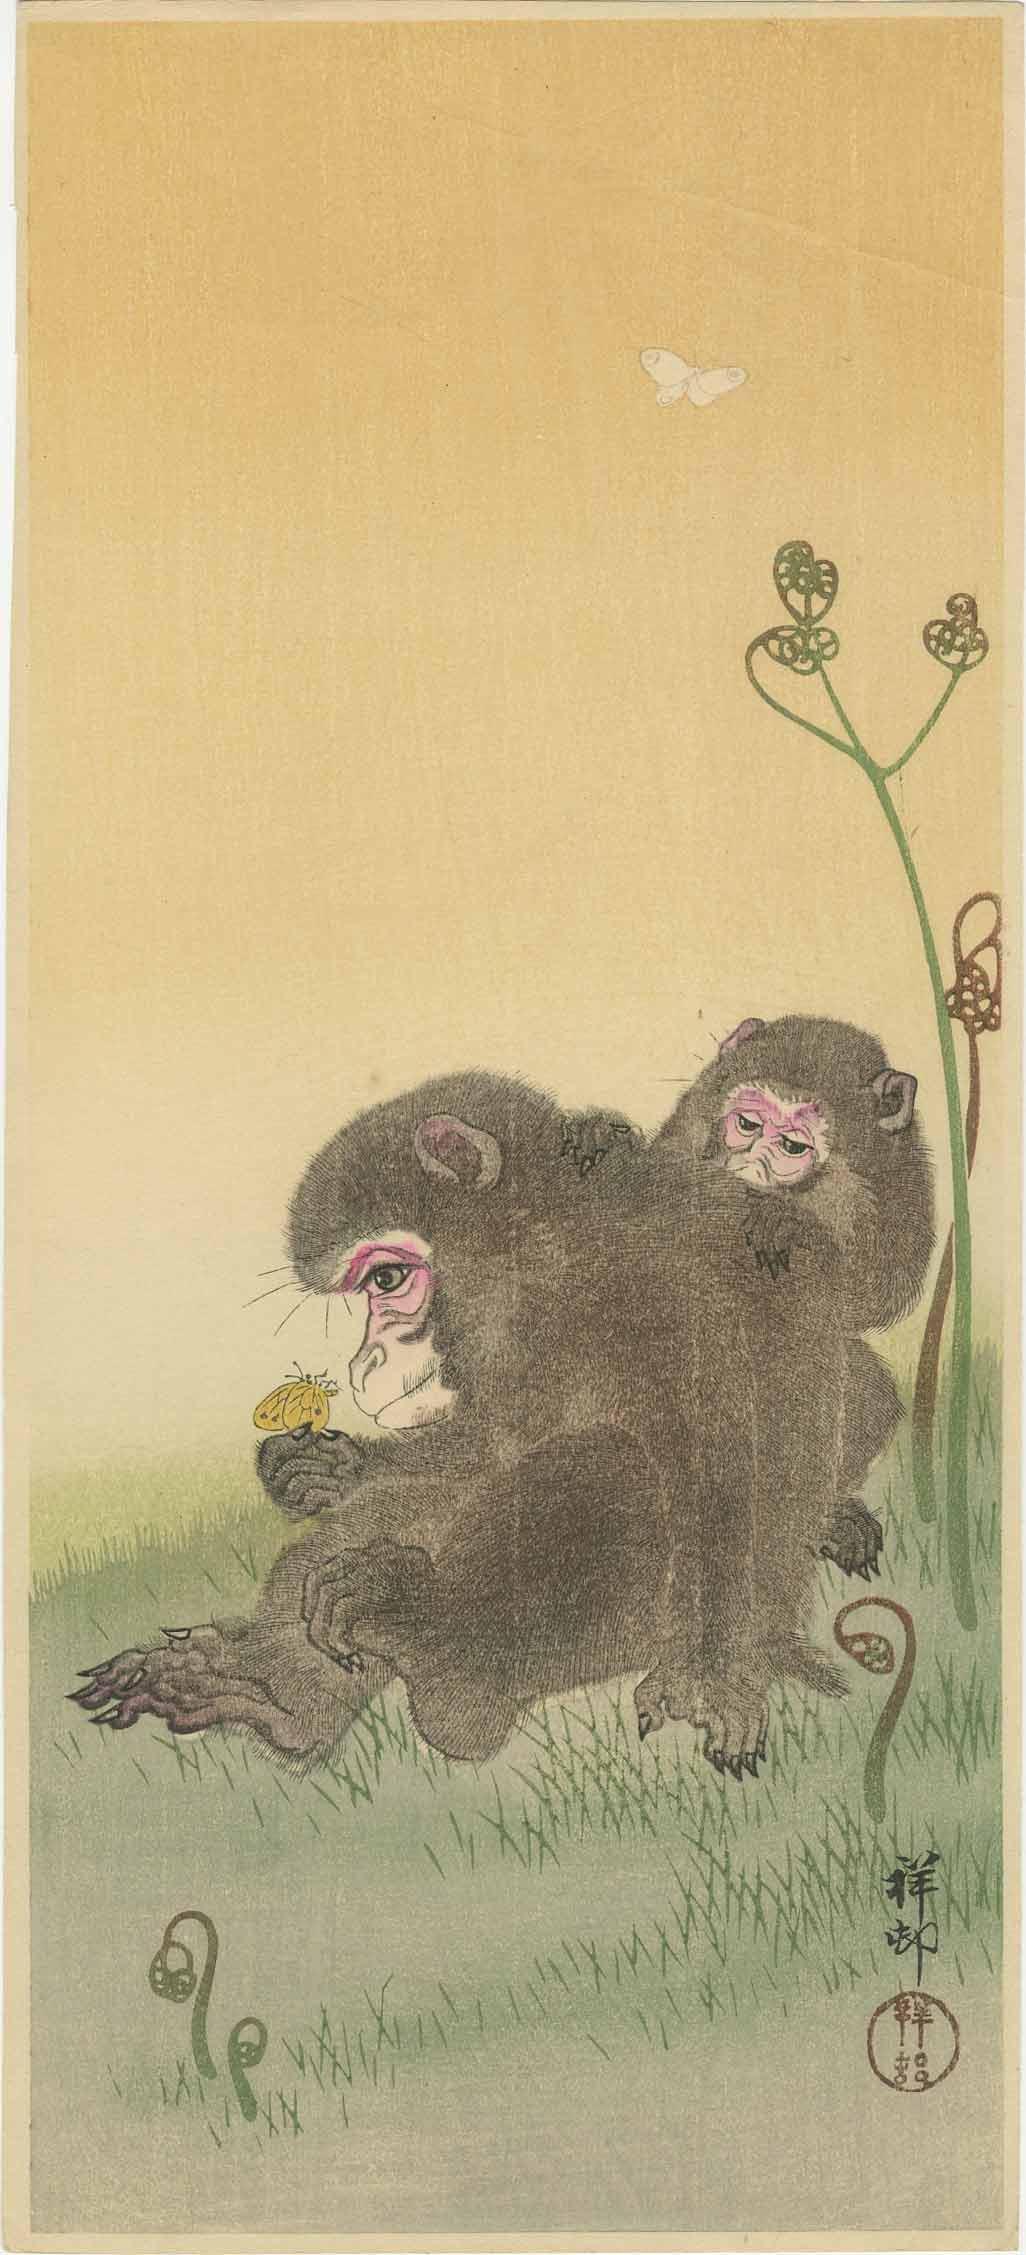 Ohara Koson - Monkeys & Butterfly c1930 woodblock